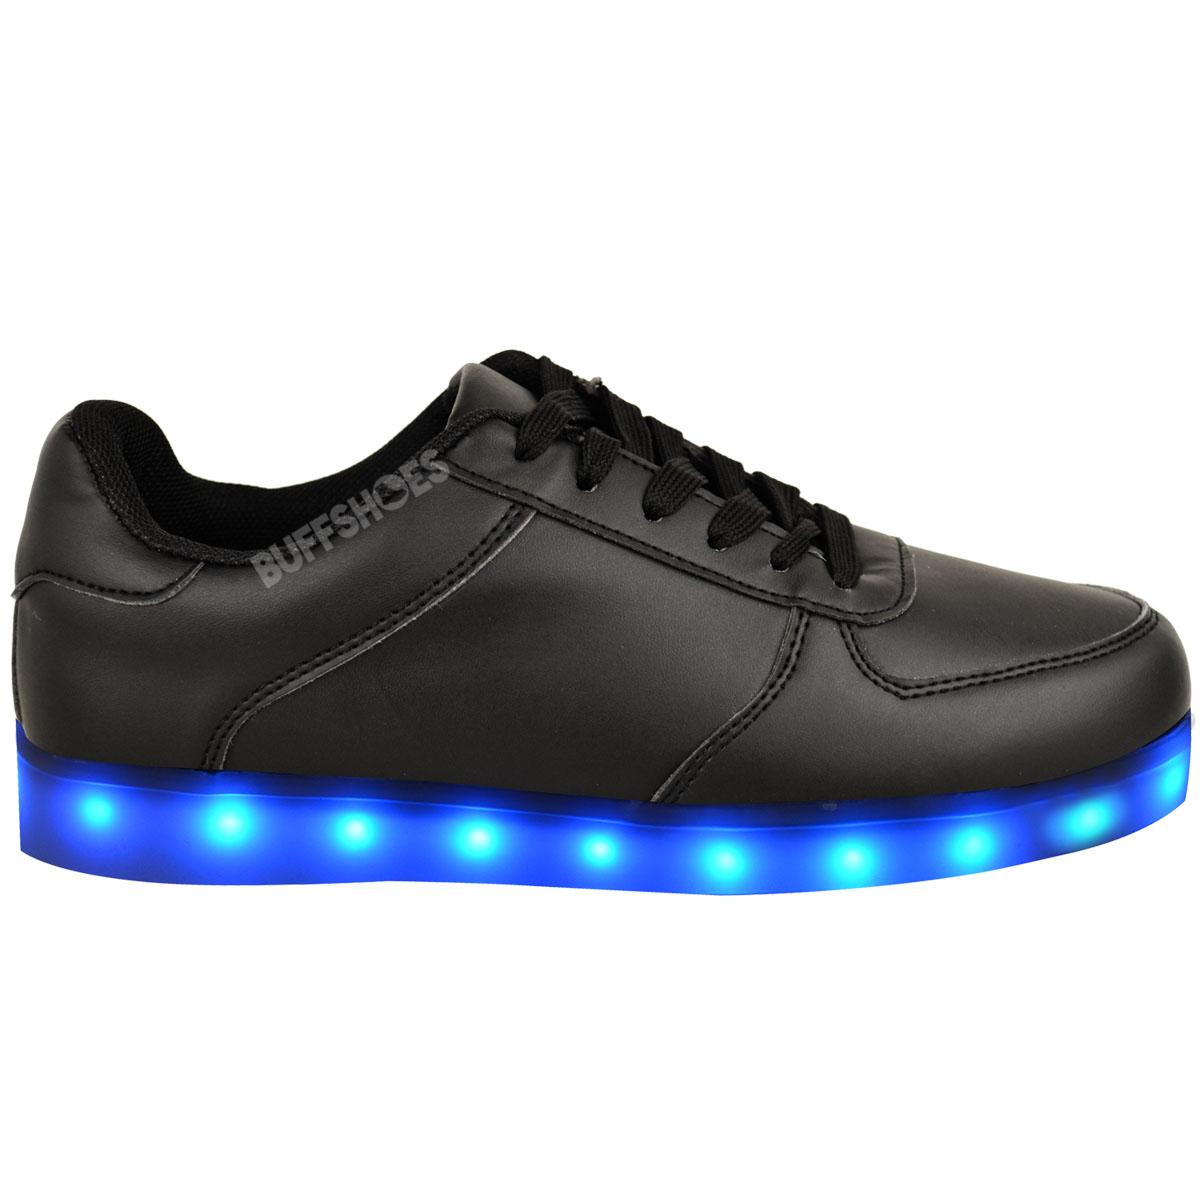 Running Shoe Lights Uk